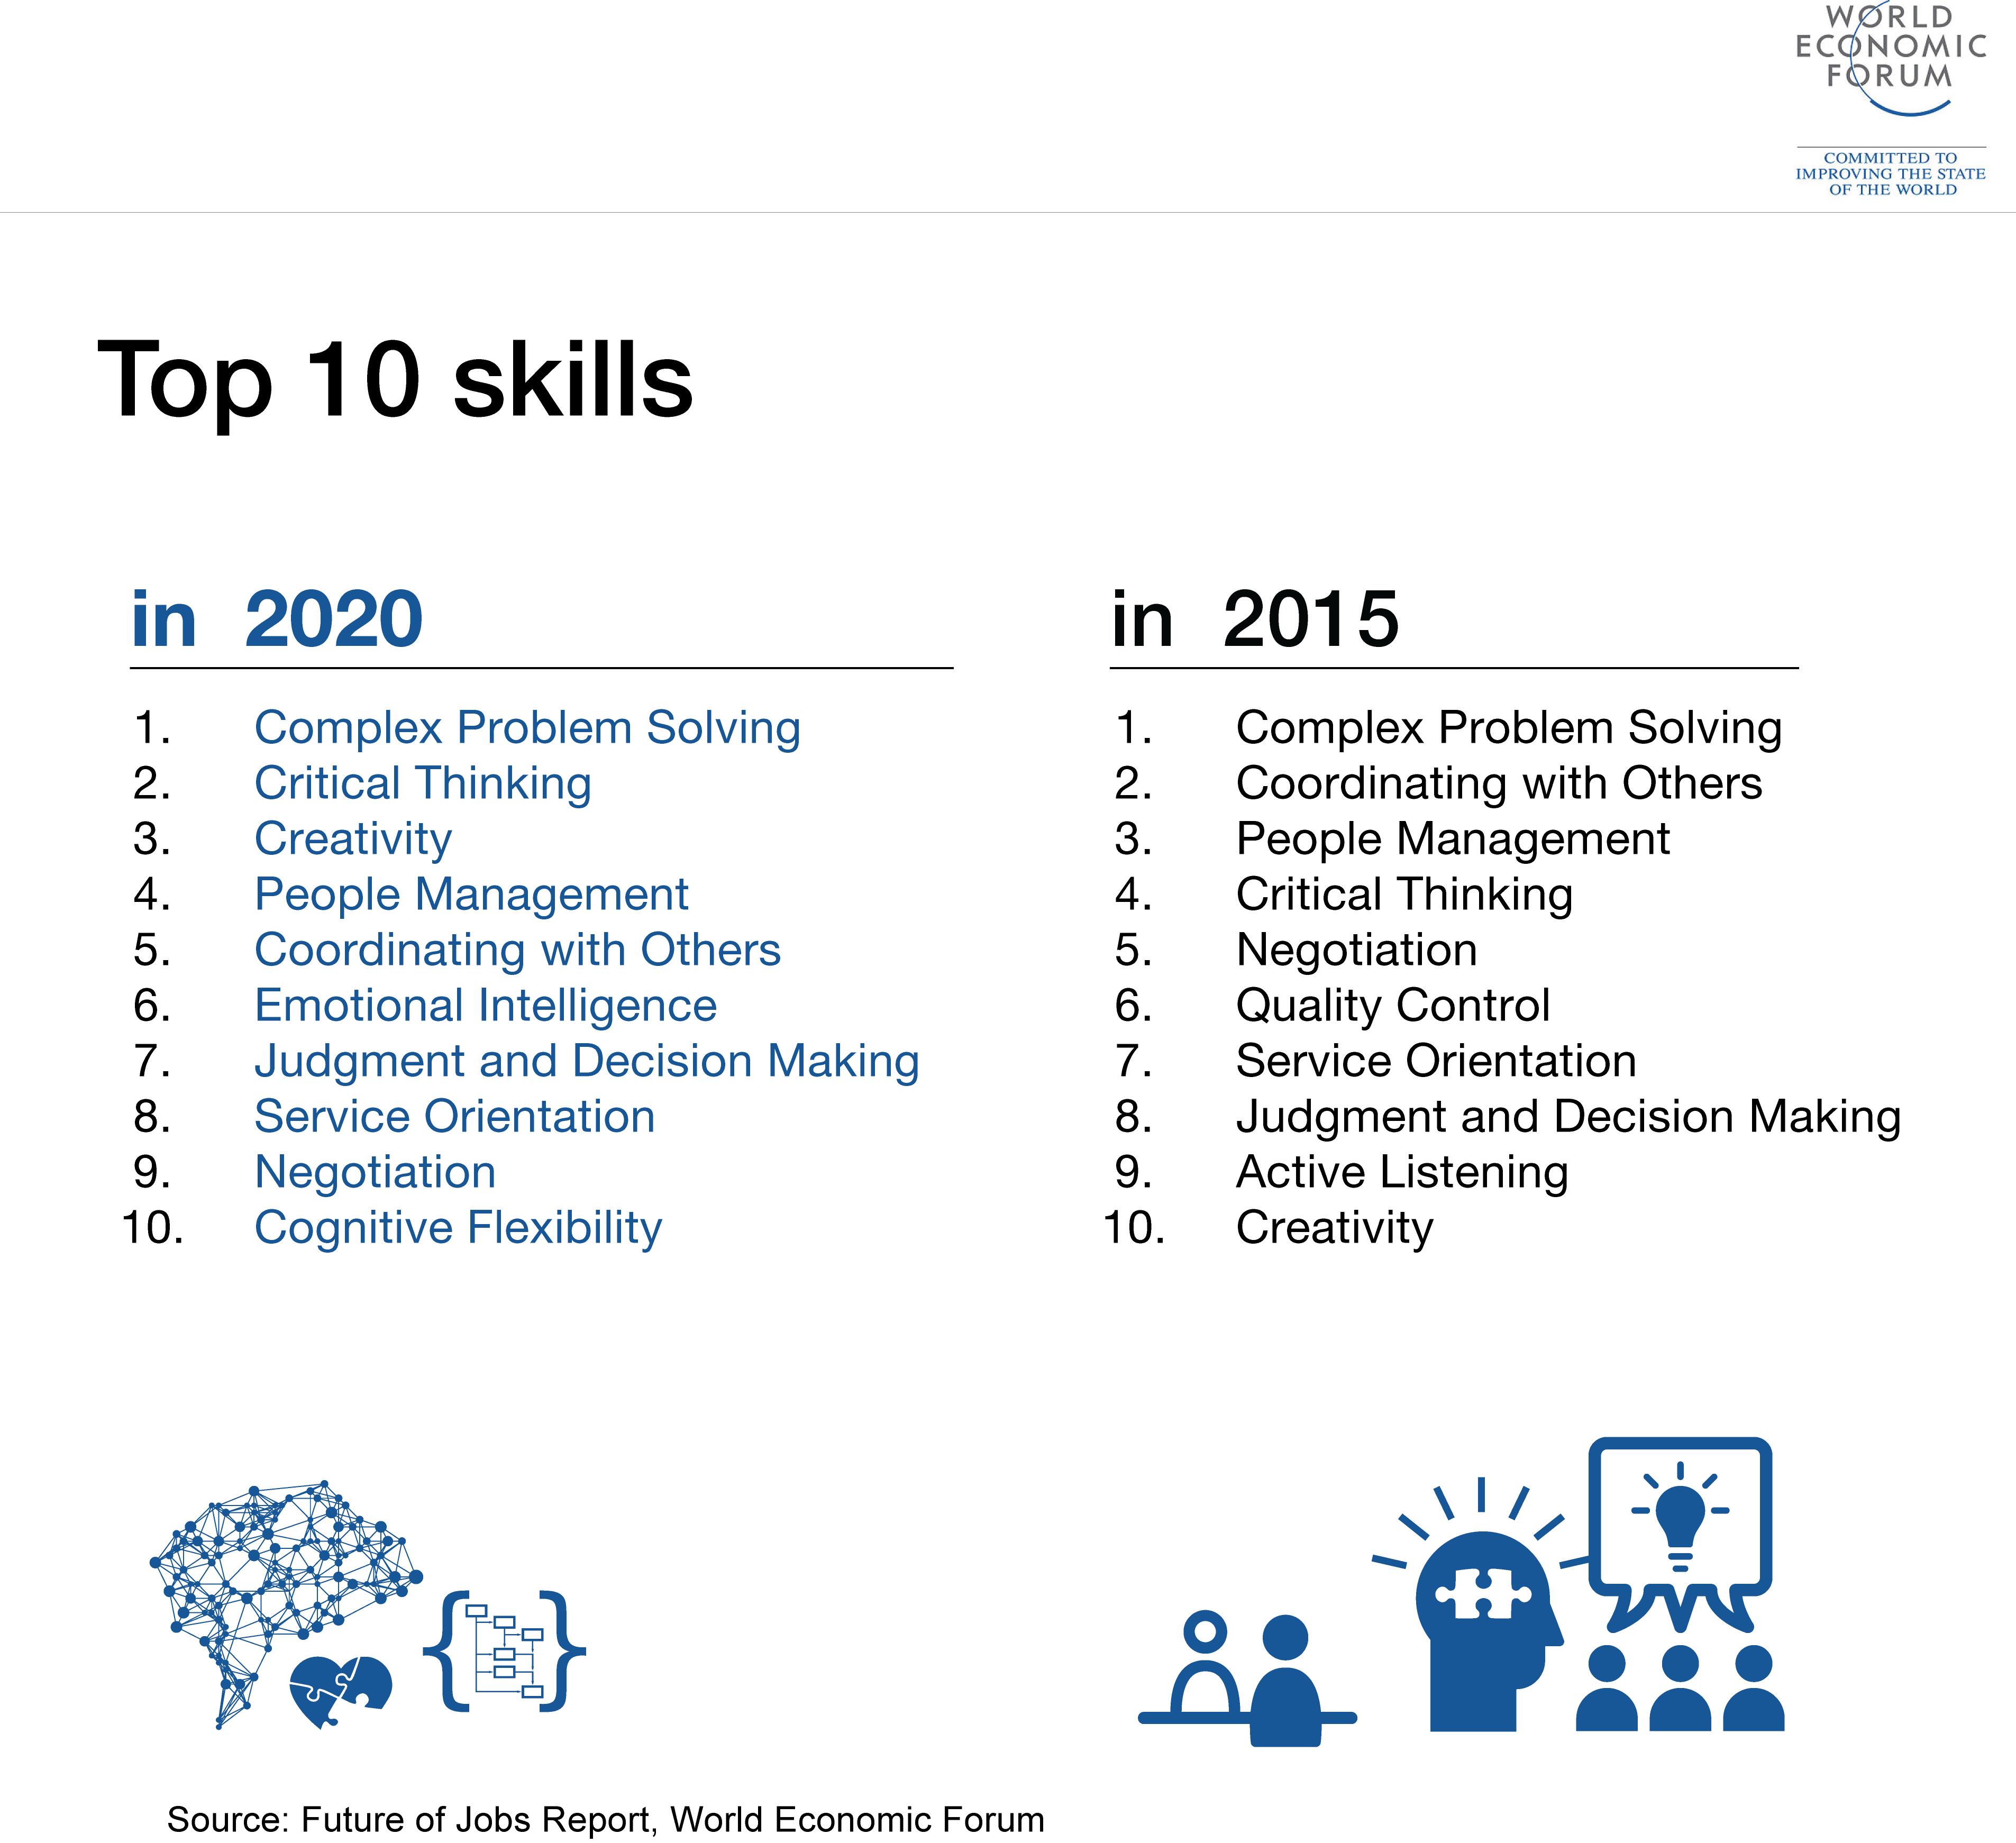 World Economic Forum On Twitter Critical Thinking Work Skills World Economic Forum